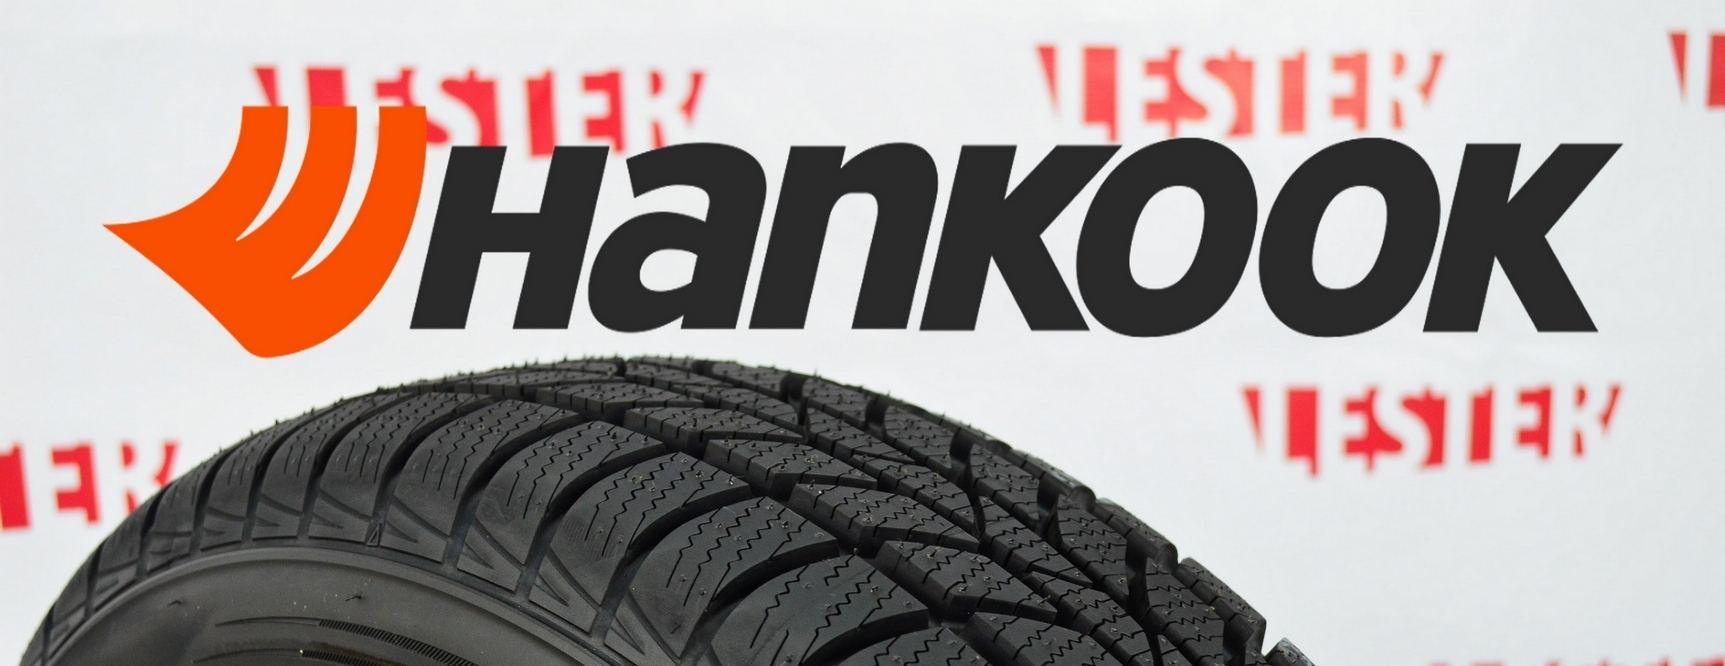 Обзор зимней шины Hankook Winter I*Cept RS W442